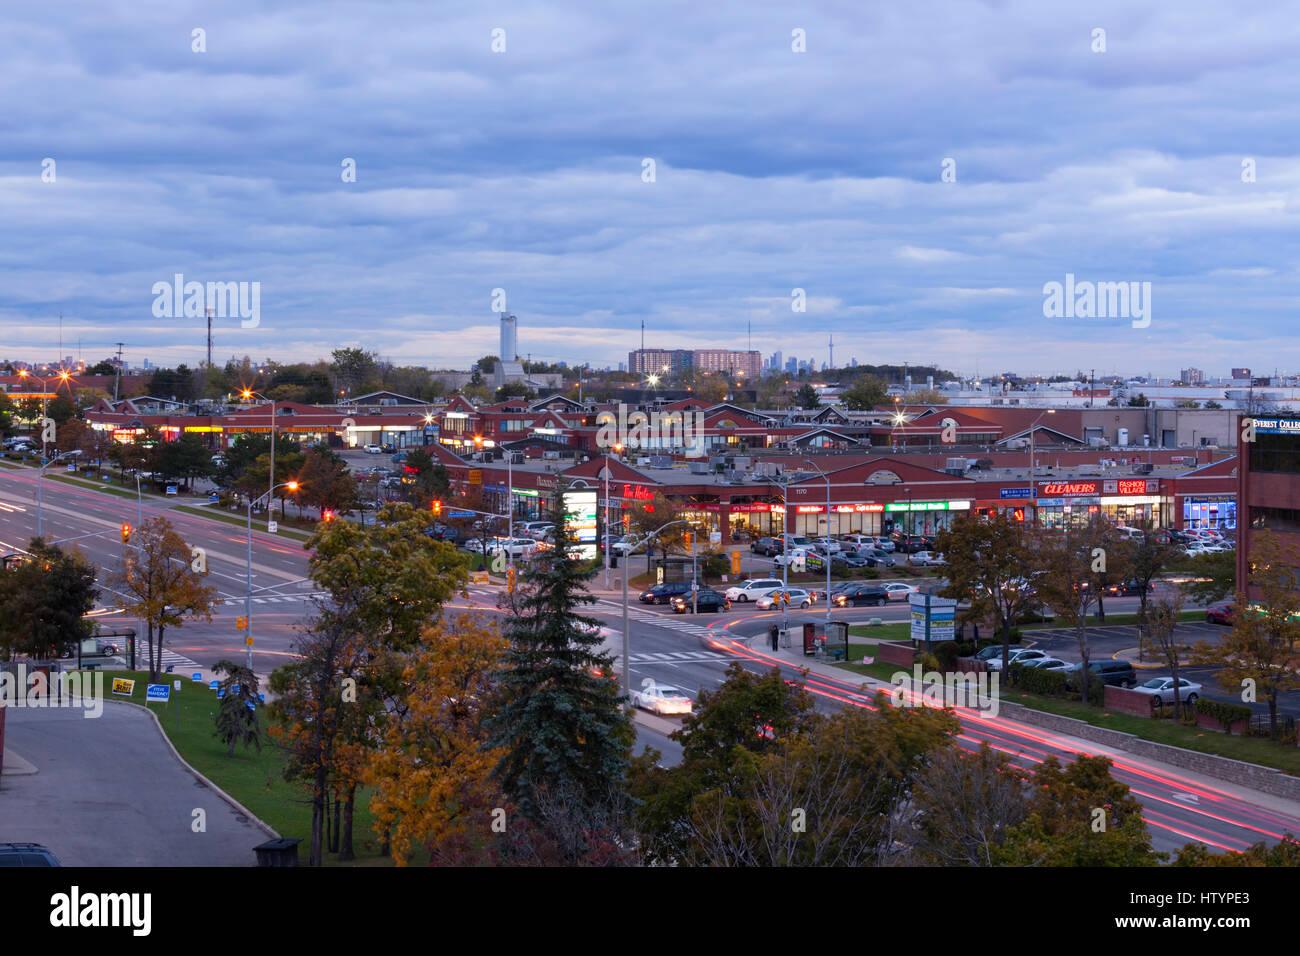 Urban sprawl in Mississauga, Ontario, Canada. - Stock Image